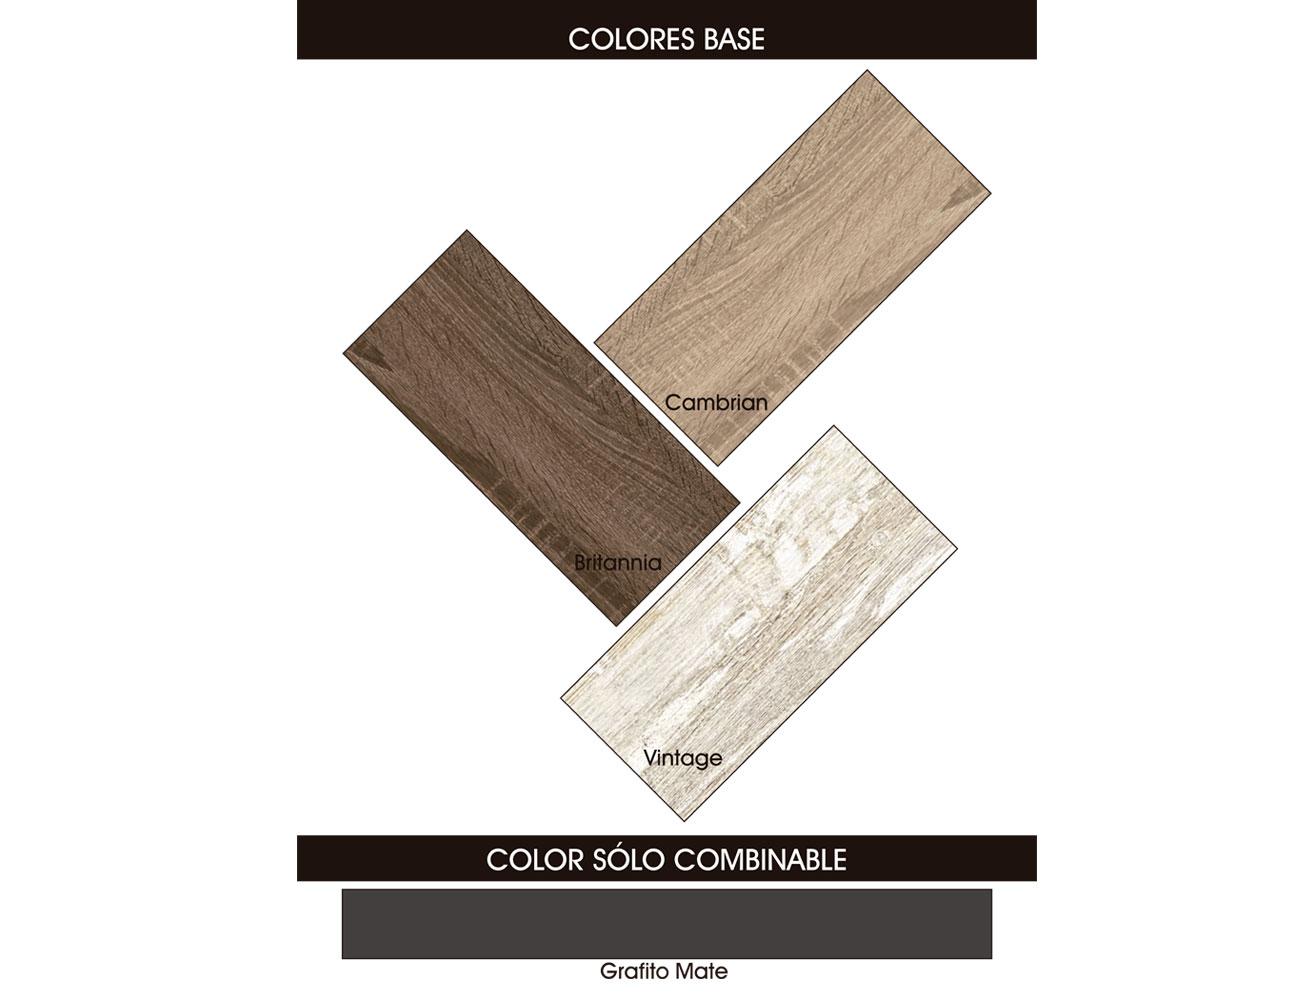 Colores 276